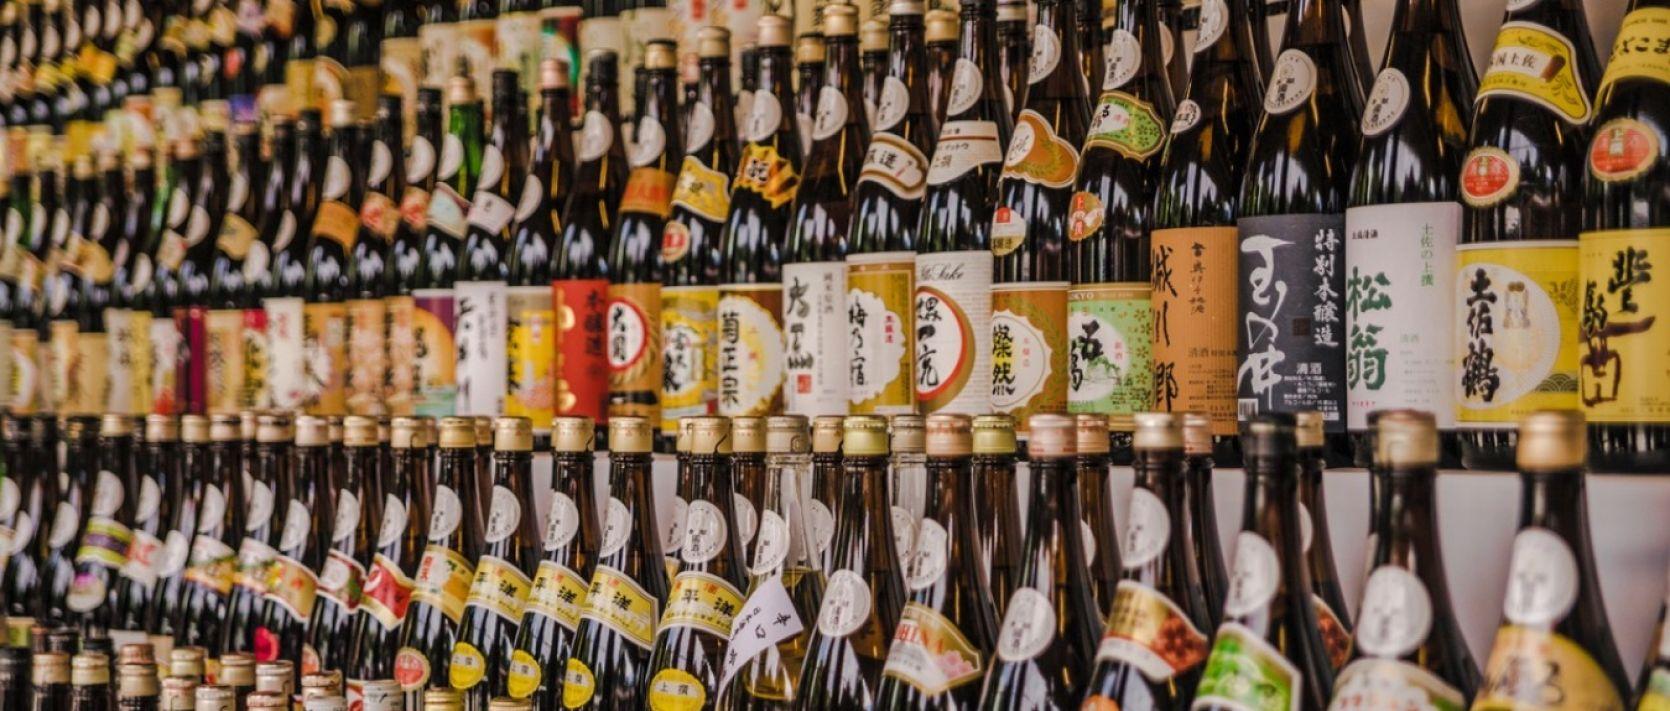 Photo for: 10 Green Bottles Standing on a Shelf